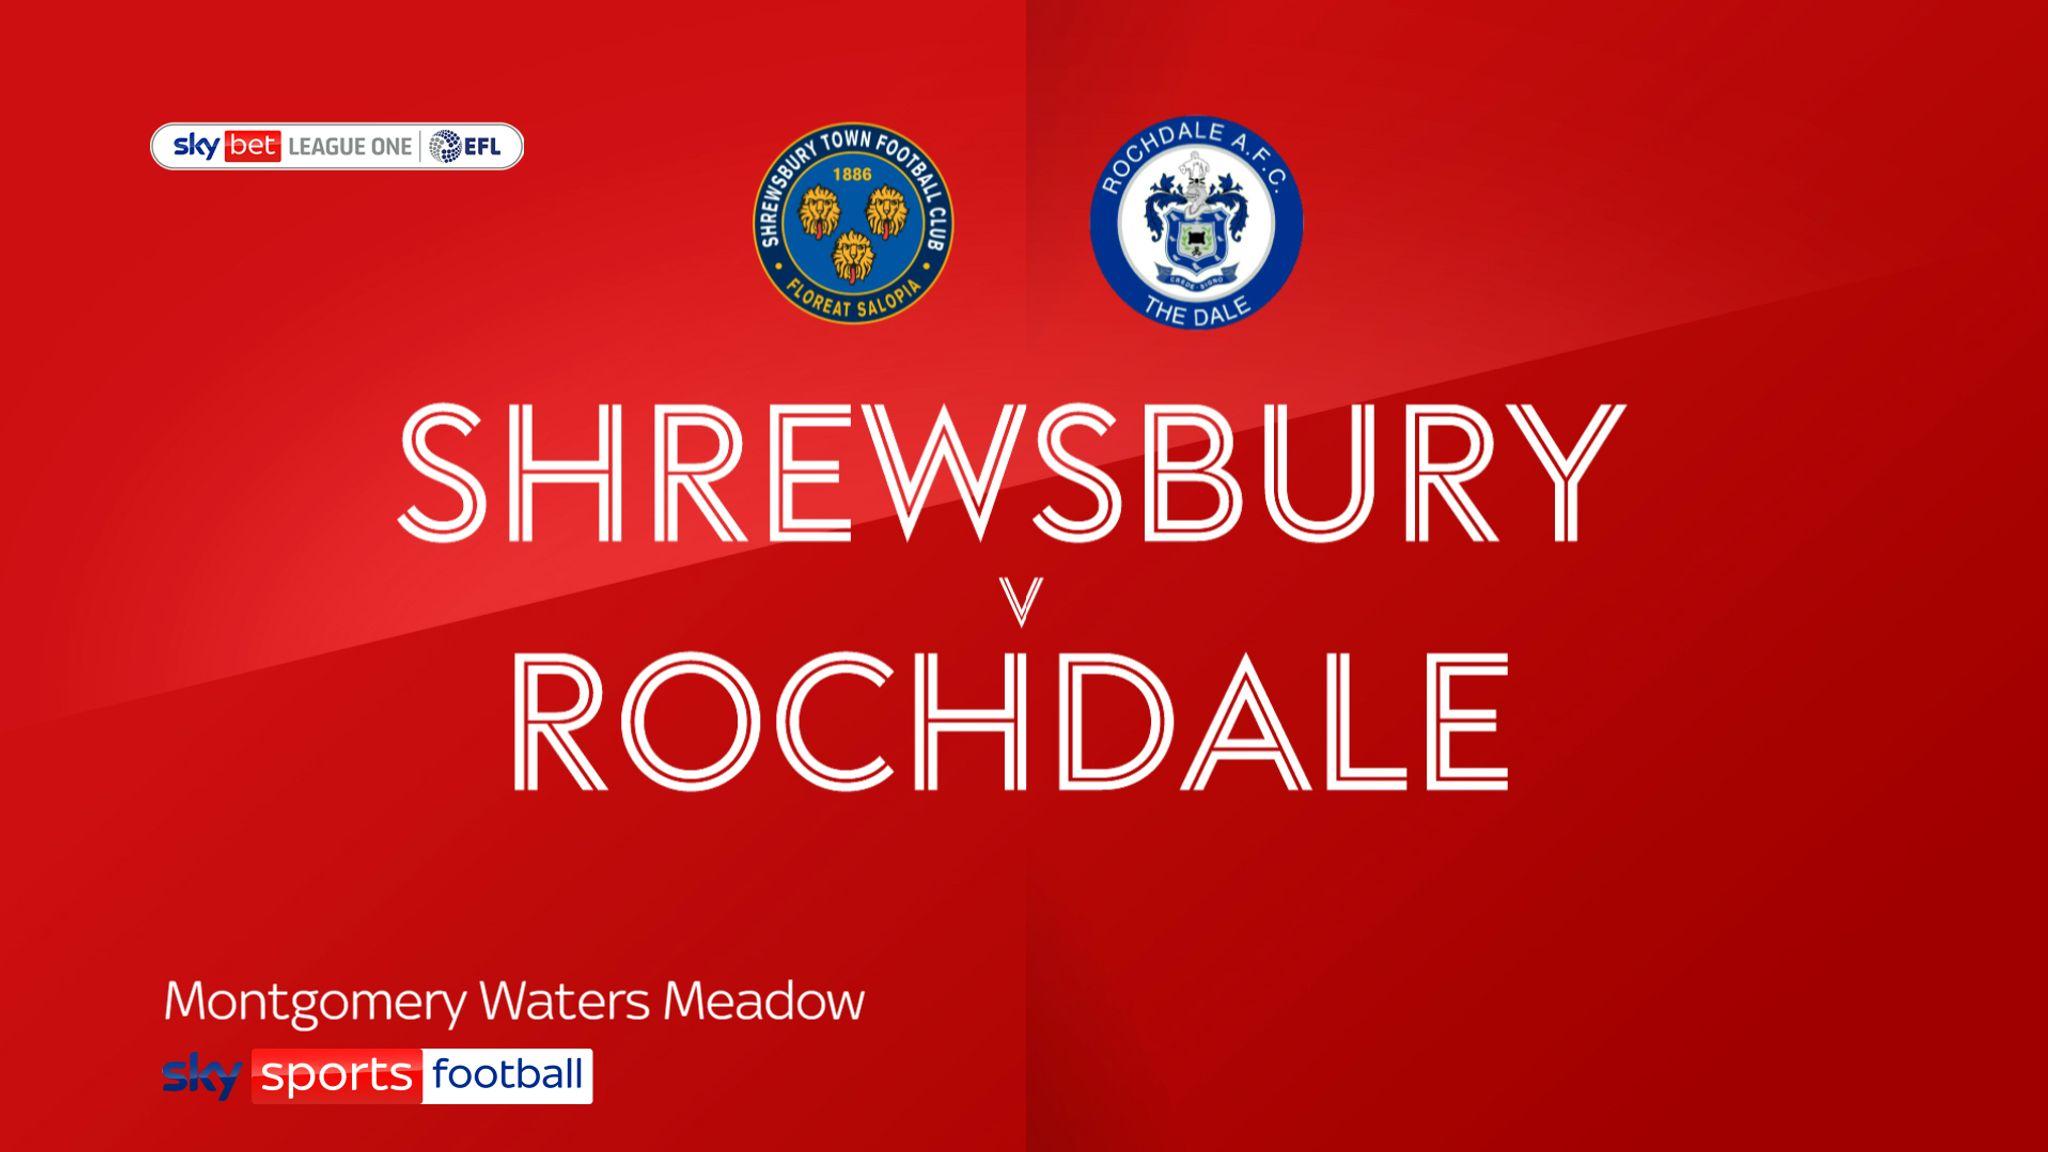 Shrewsbury 1-2 Rochdale: Alex Newby scores winner for Dale